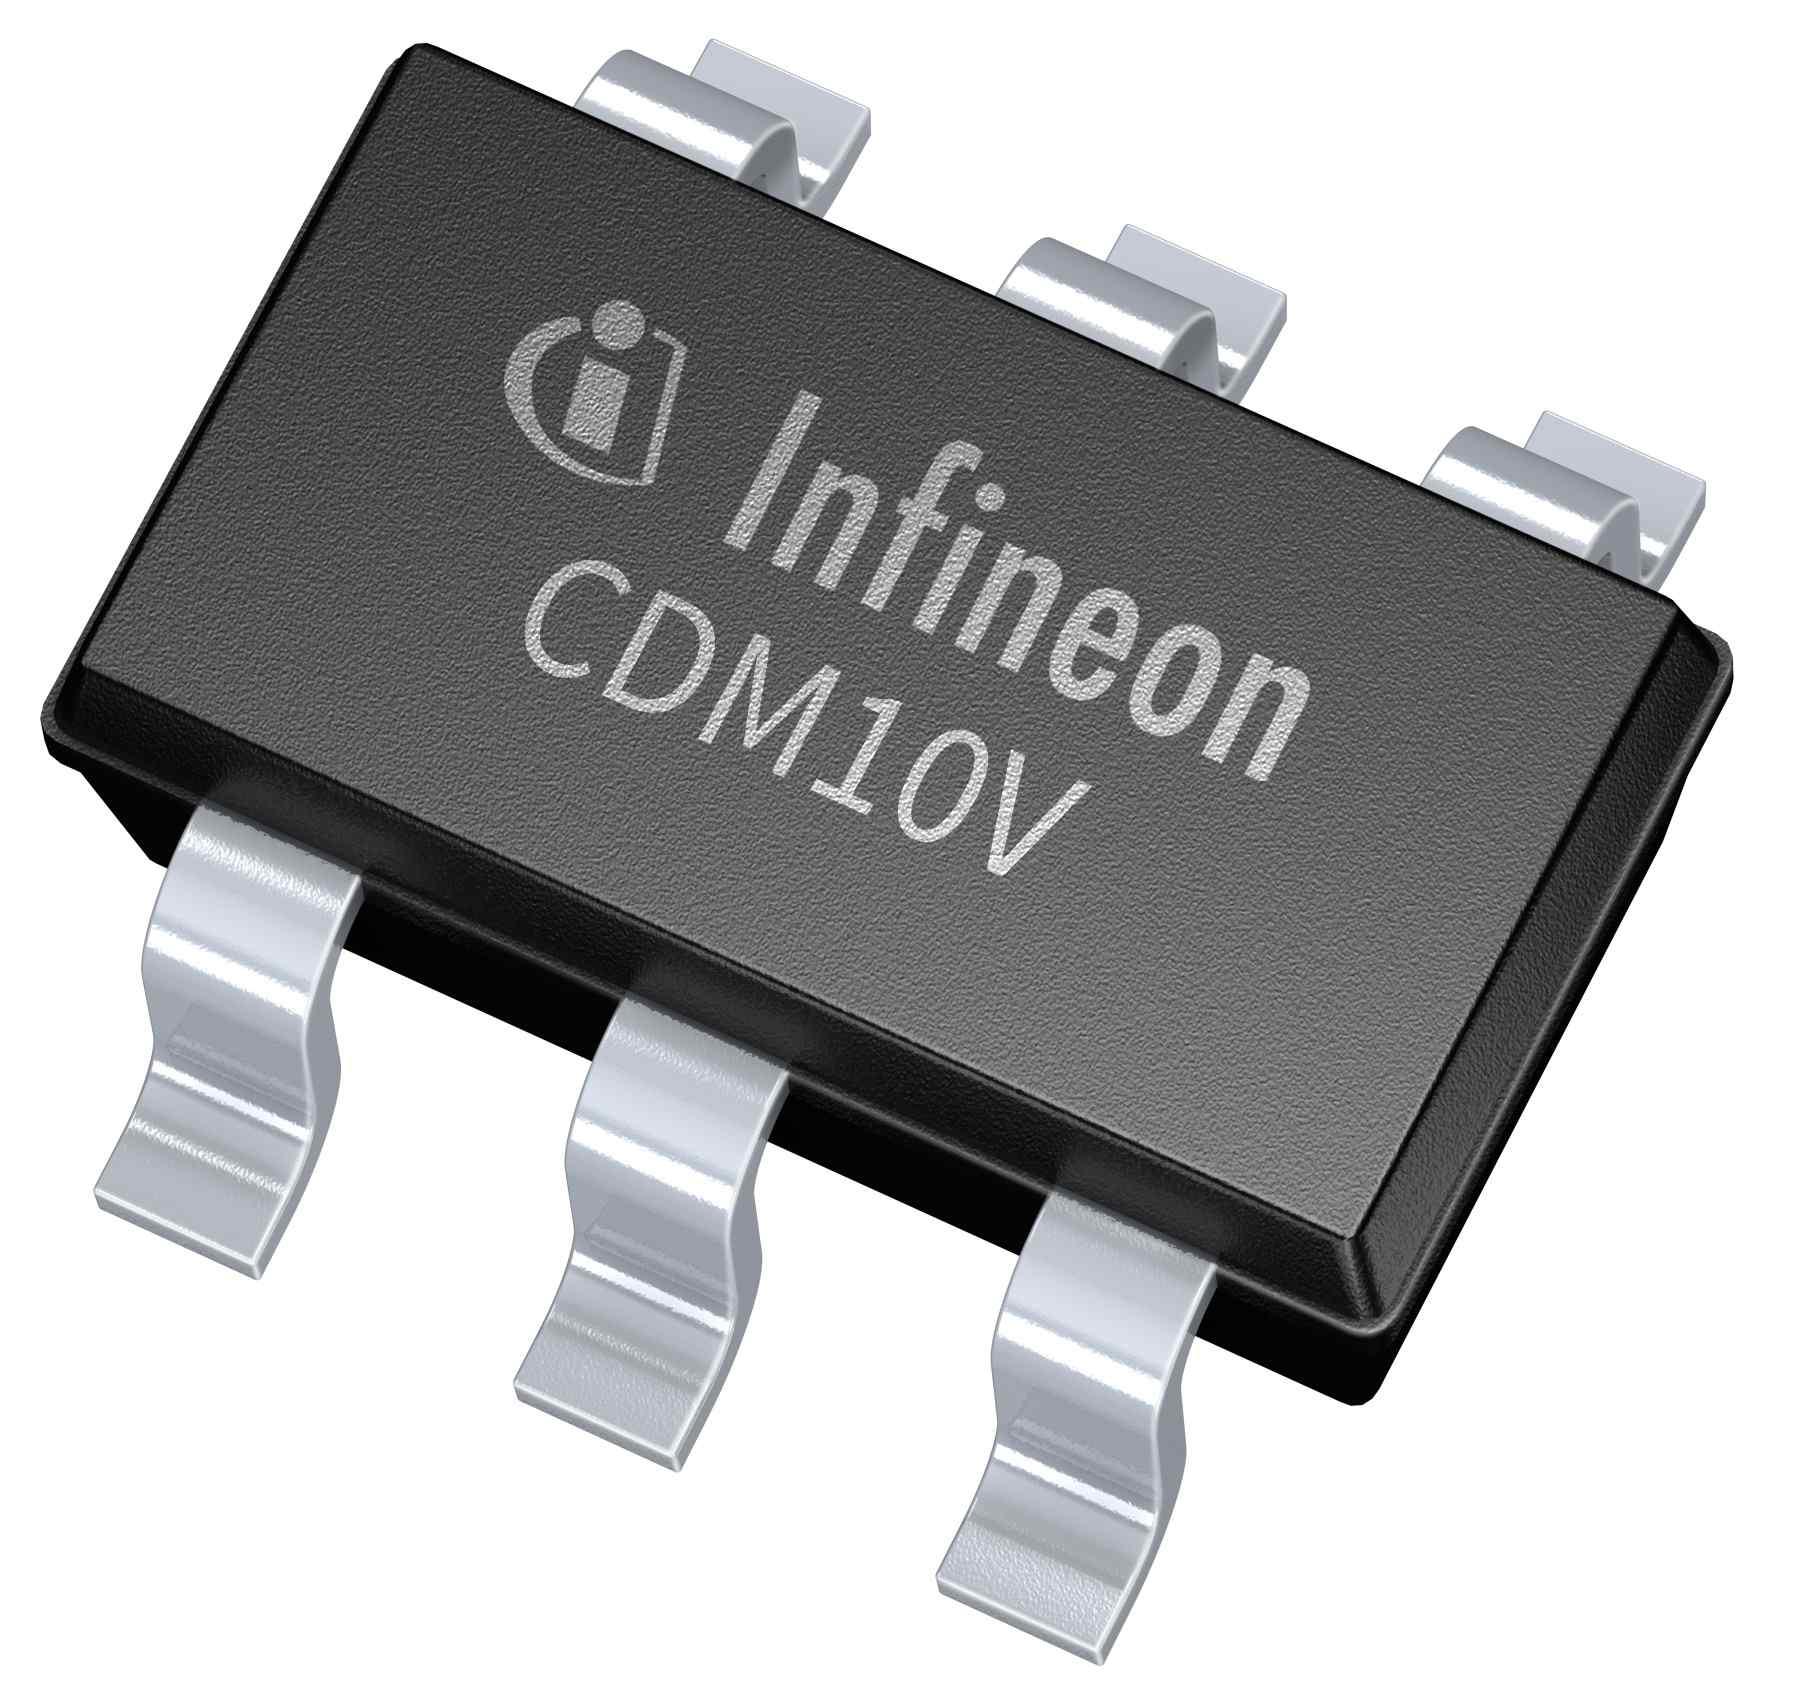 Xdpl8105 Infineon Technologies White Led Driver Circuits For Offline Applications Using Standard Pwm Cdm10v 4